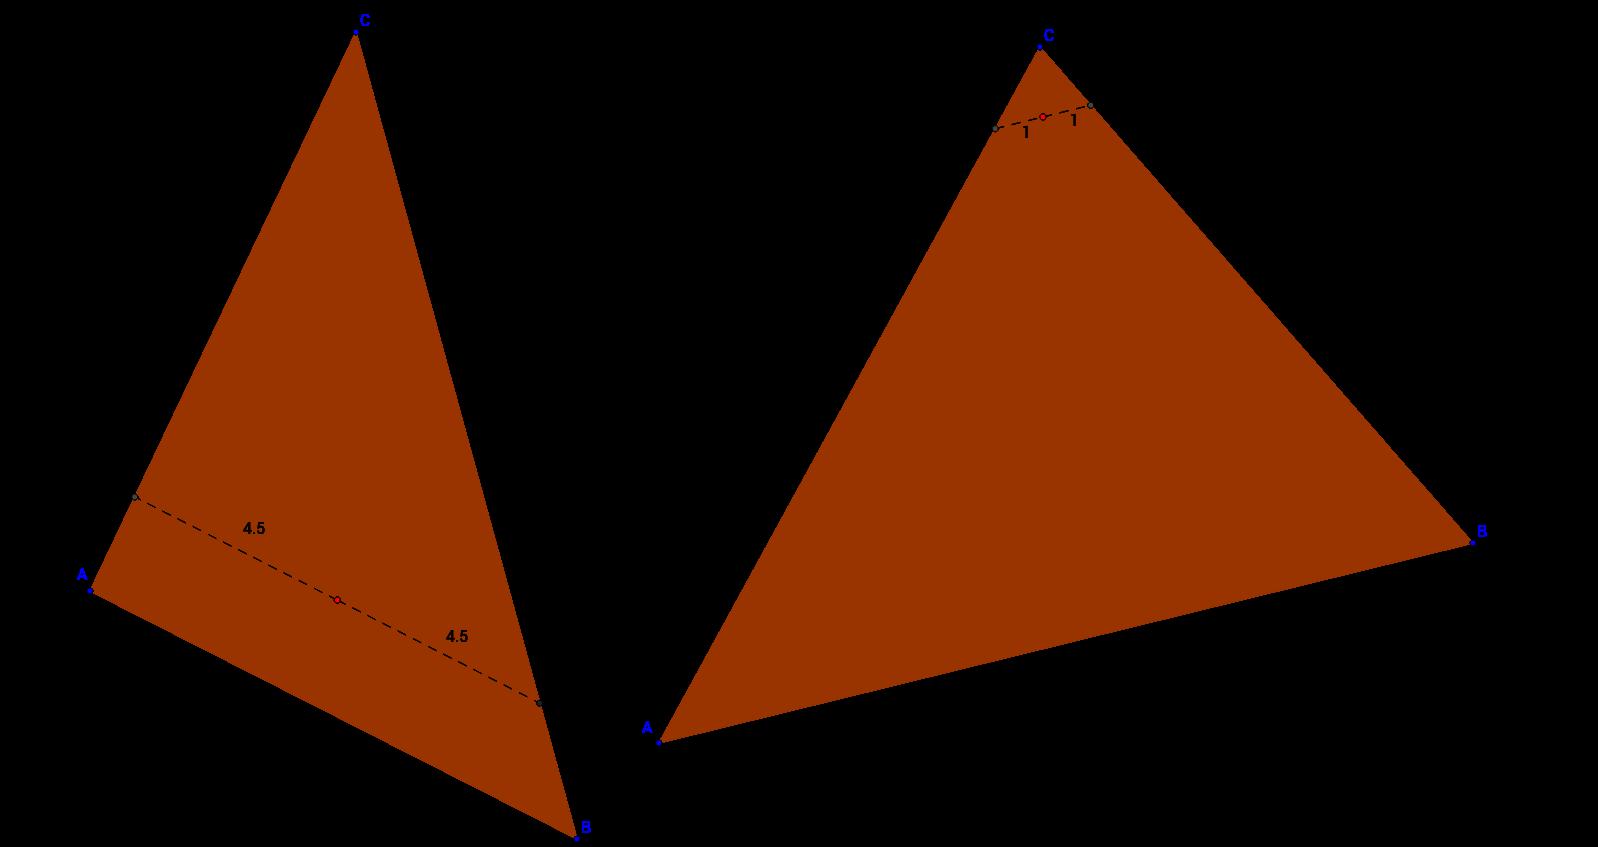 GDRS – Lot im Dreieck